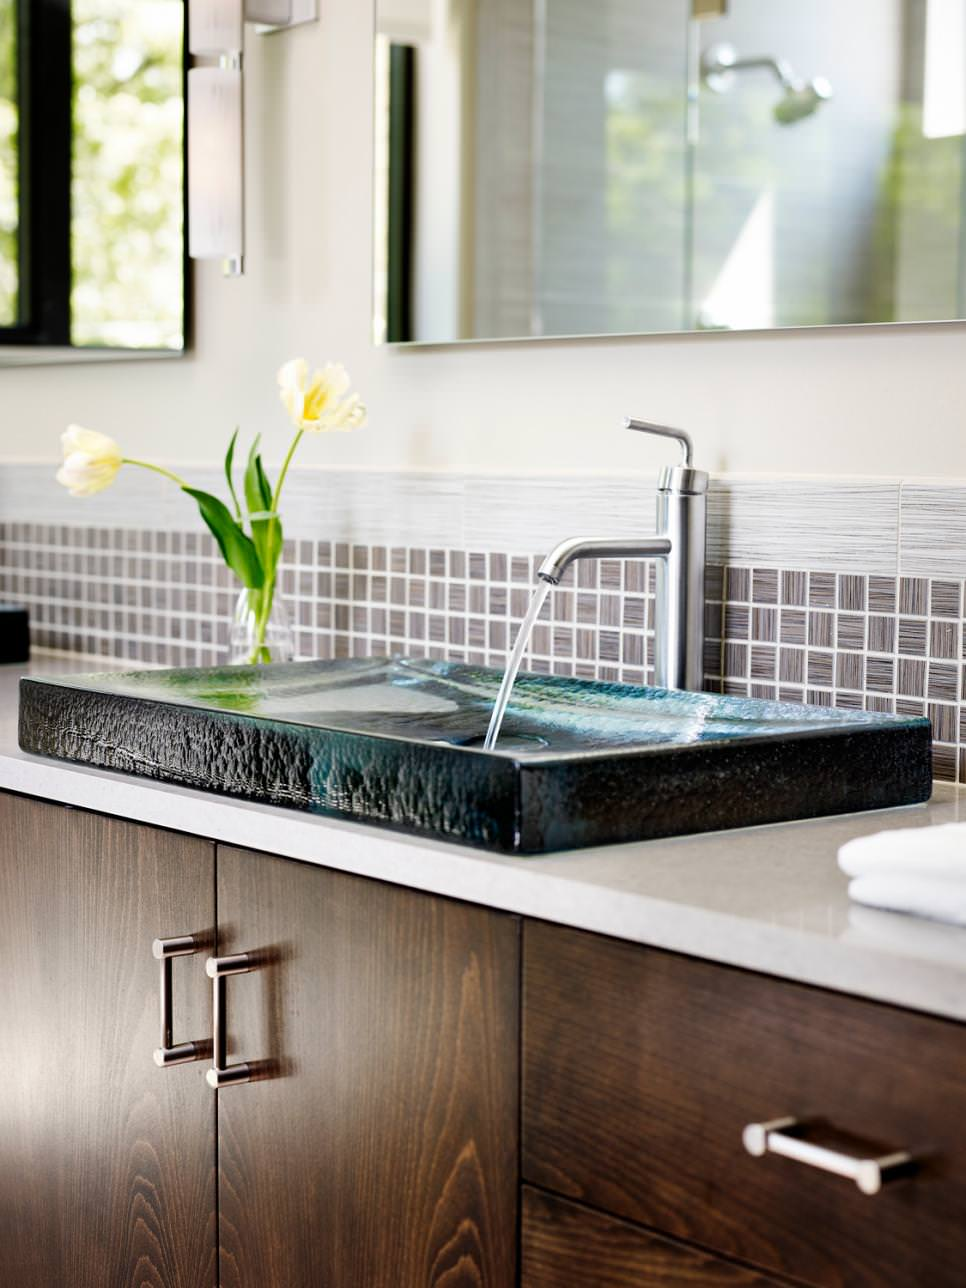 24 Bathroom Sinks Ideas Designs  Design Trends